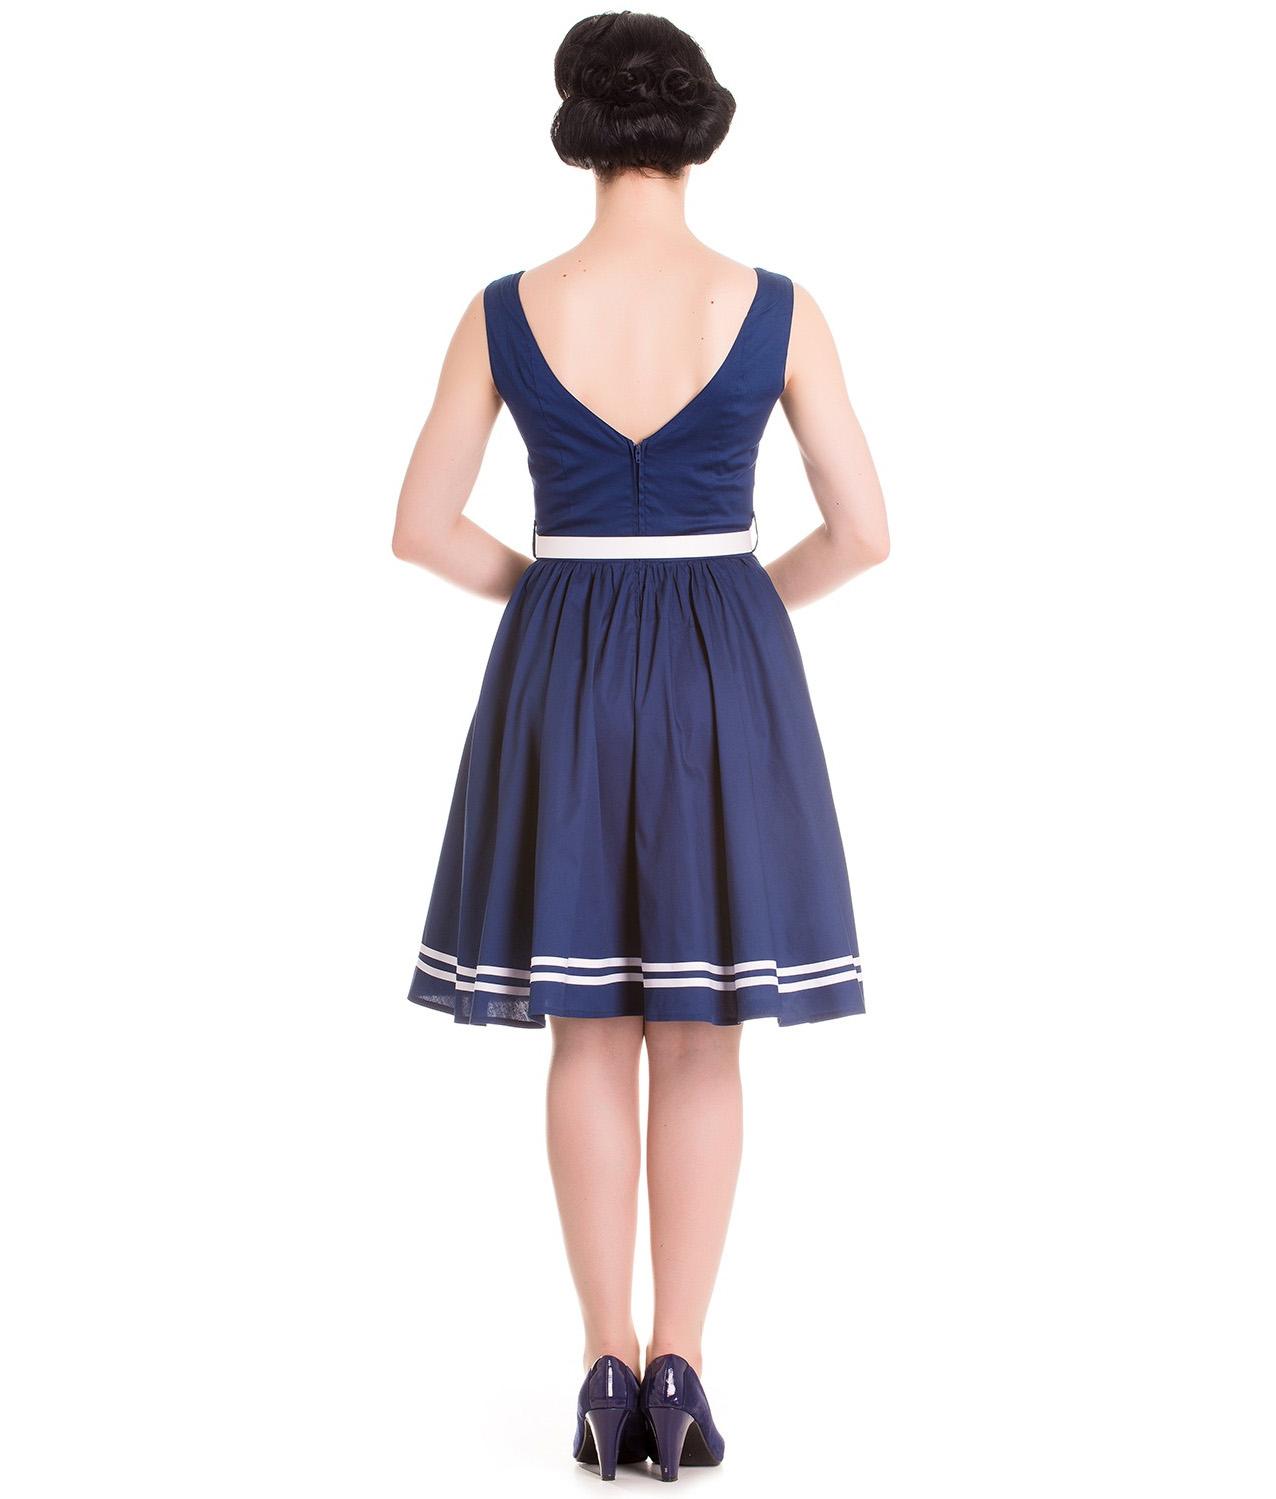 Hell-Bunny-Nautical-Sailor-Pin-Up-Mid-Length-50s-Dress-ARIEL-Navy-Blue-All-Sizes thumbnail 5